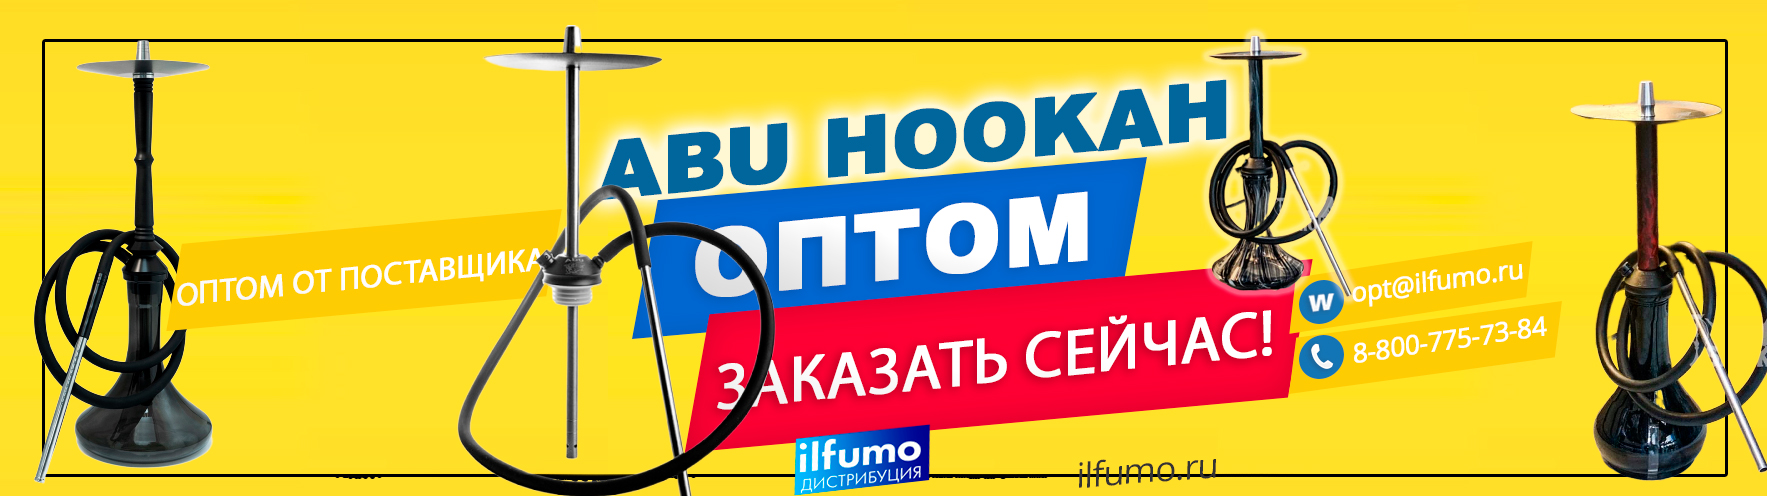 kaljan abu hookah - Кальян Abu Hookah